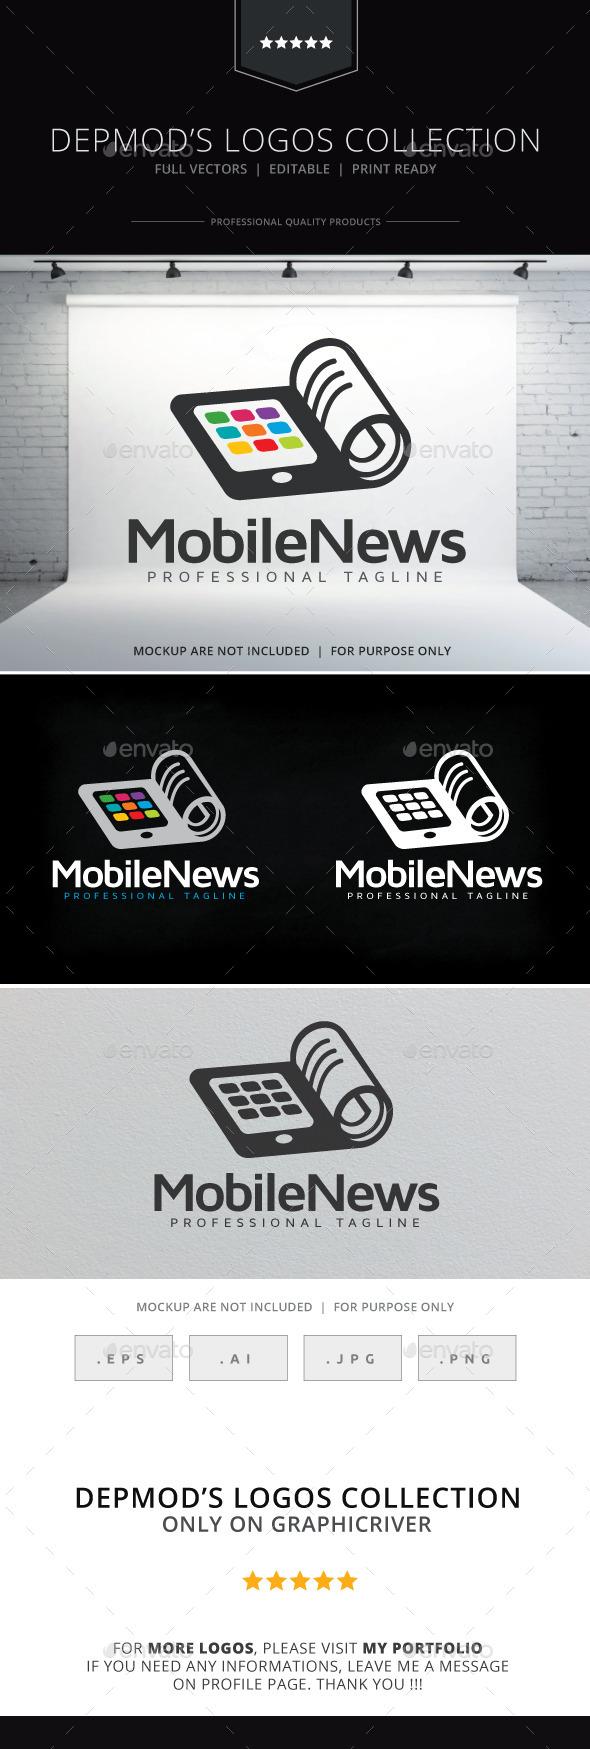 Mobile News Logo